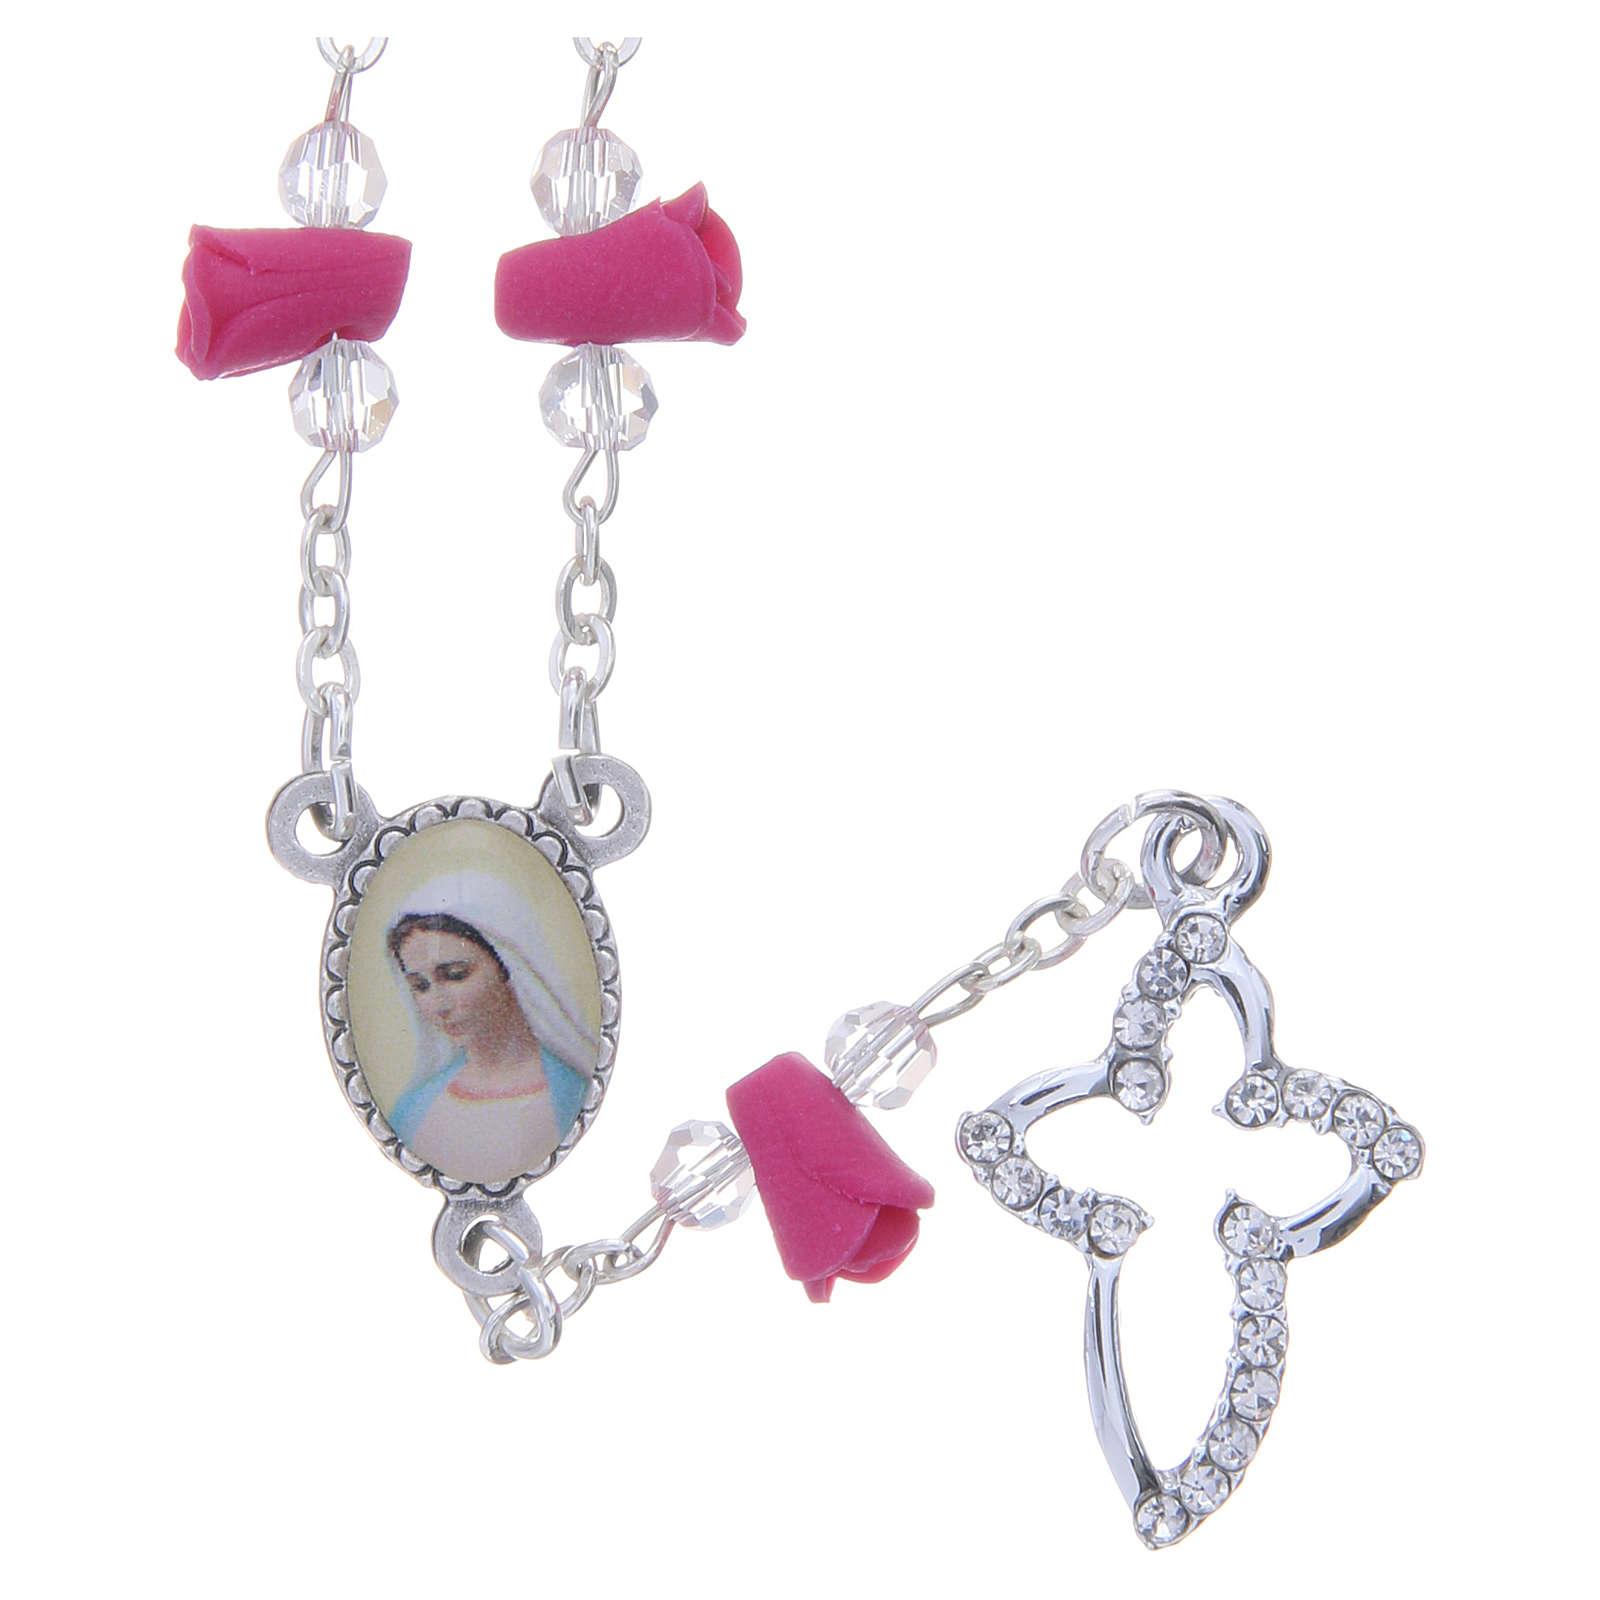 Collana rosario Medjugorje rose fucsia ceramica icona Madonna 4